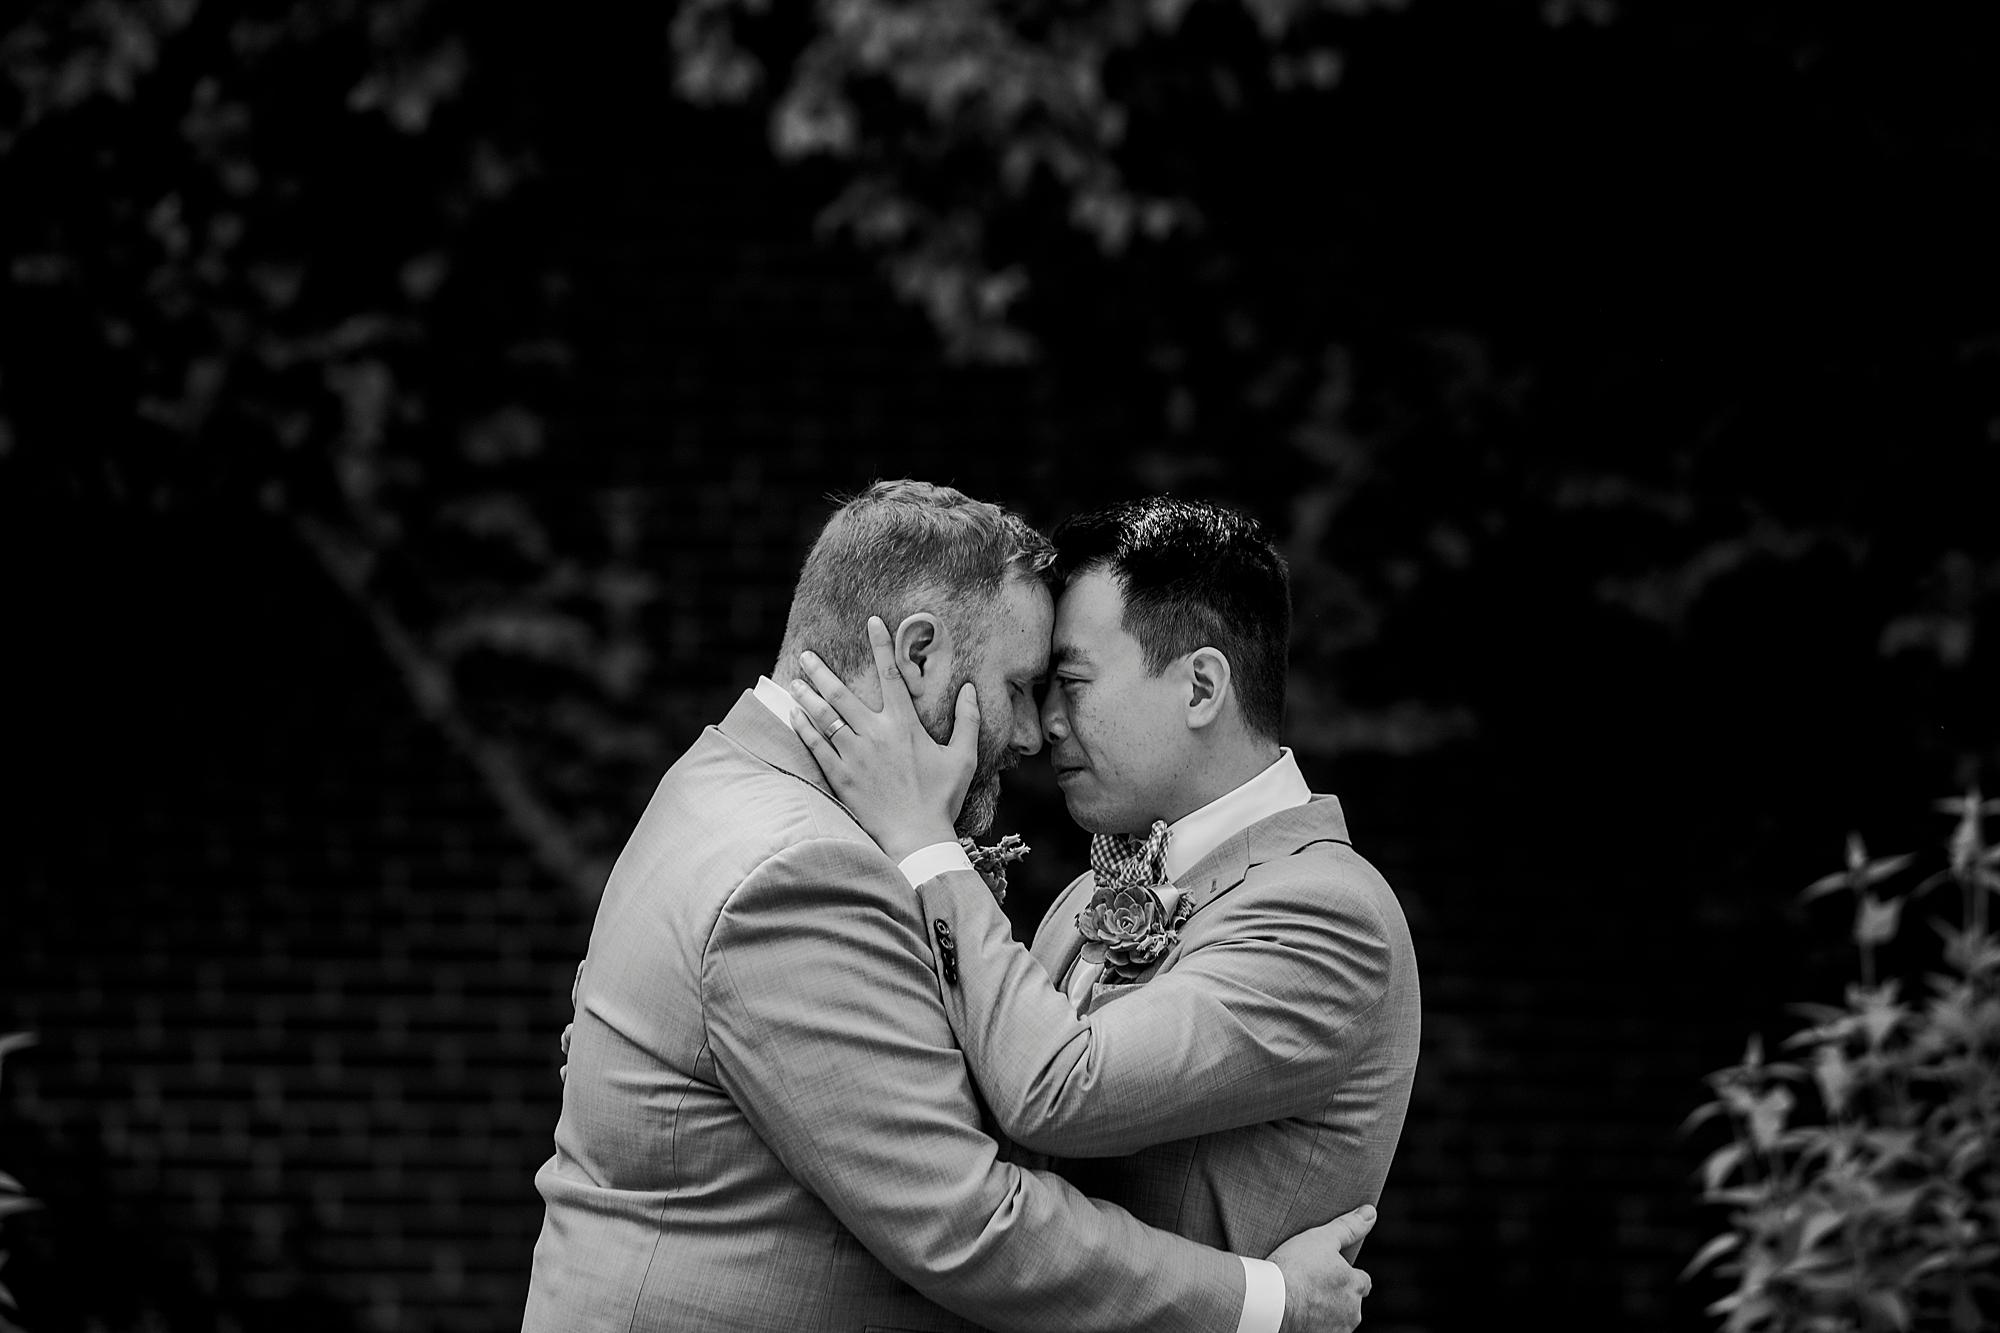 Dan_and_Byron_Love_by_Joe_Mac_Philadelphia_Wedding_LGBTQ_Photography_Gay_Independence_visitor_Center_37.JPG